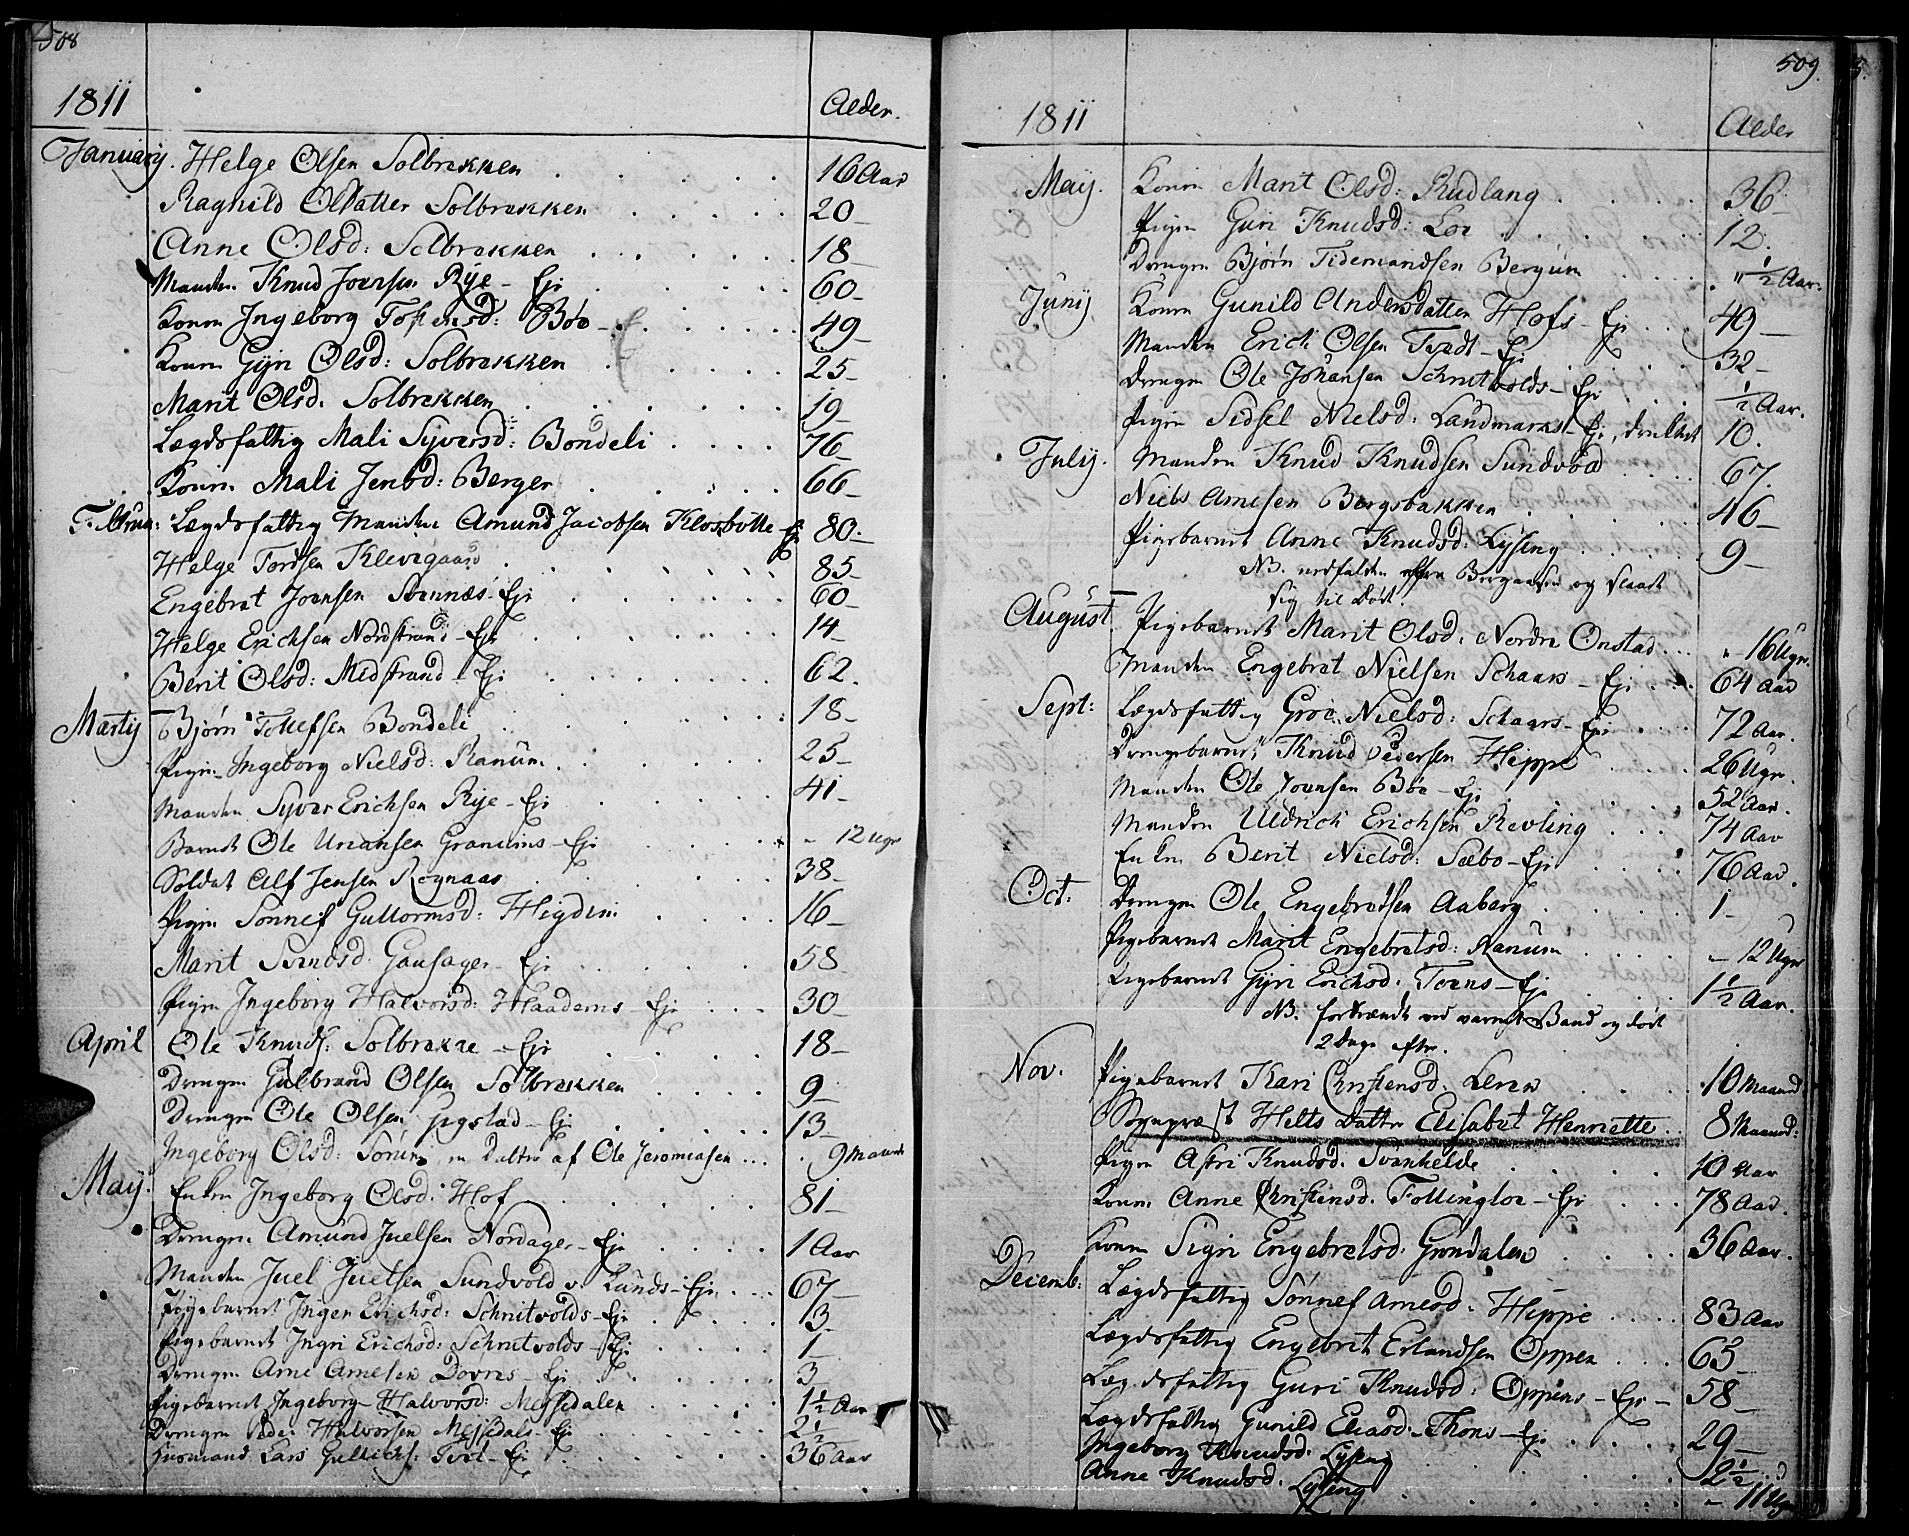 SAH, Nord-Aurdal prestekontor, Ministerialbok nr. 1, 1808-1815, s. 508-509